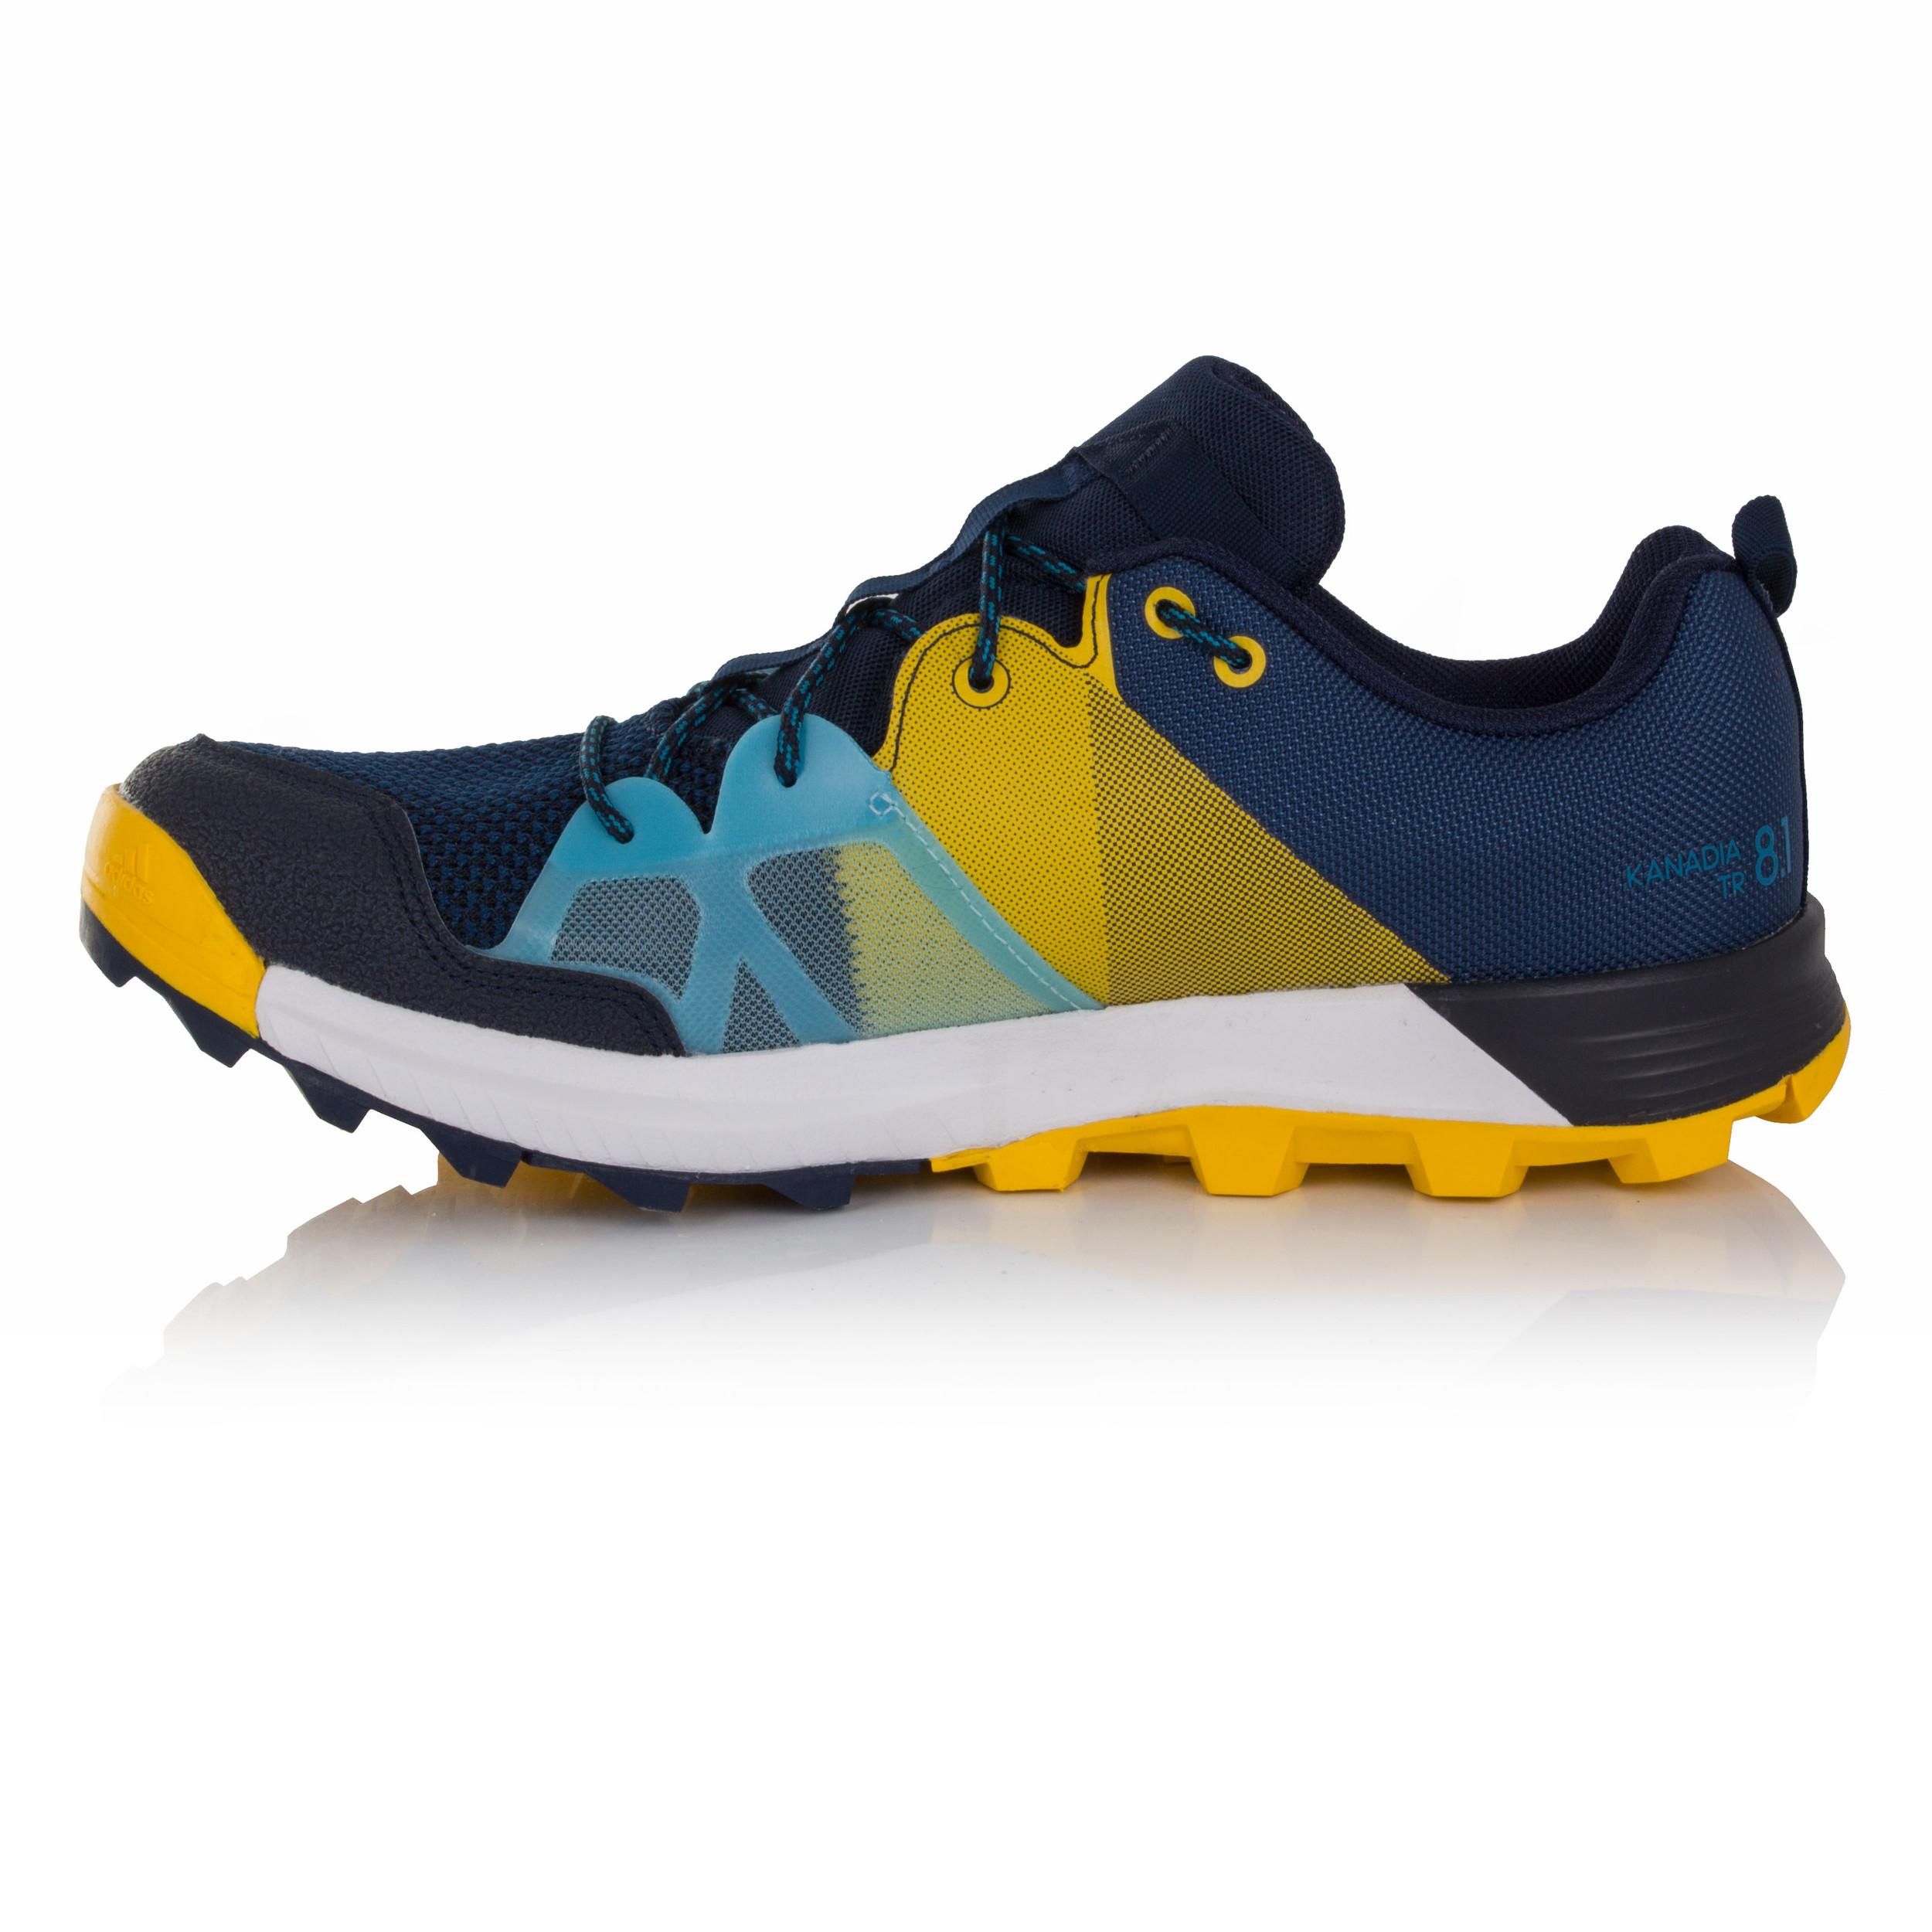 Adidas-Kanadia-8-1-Mens-Yellow-Blue-Trail-